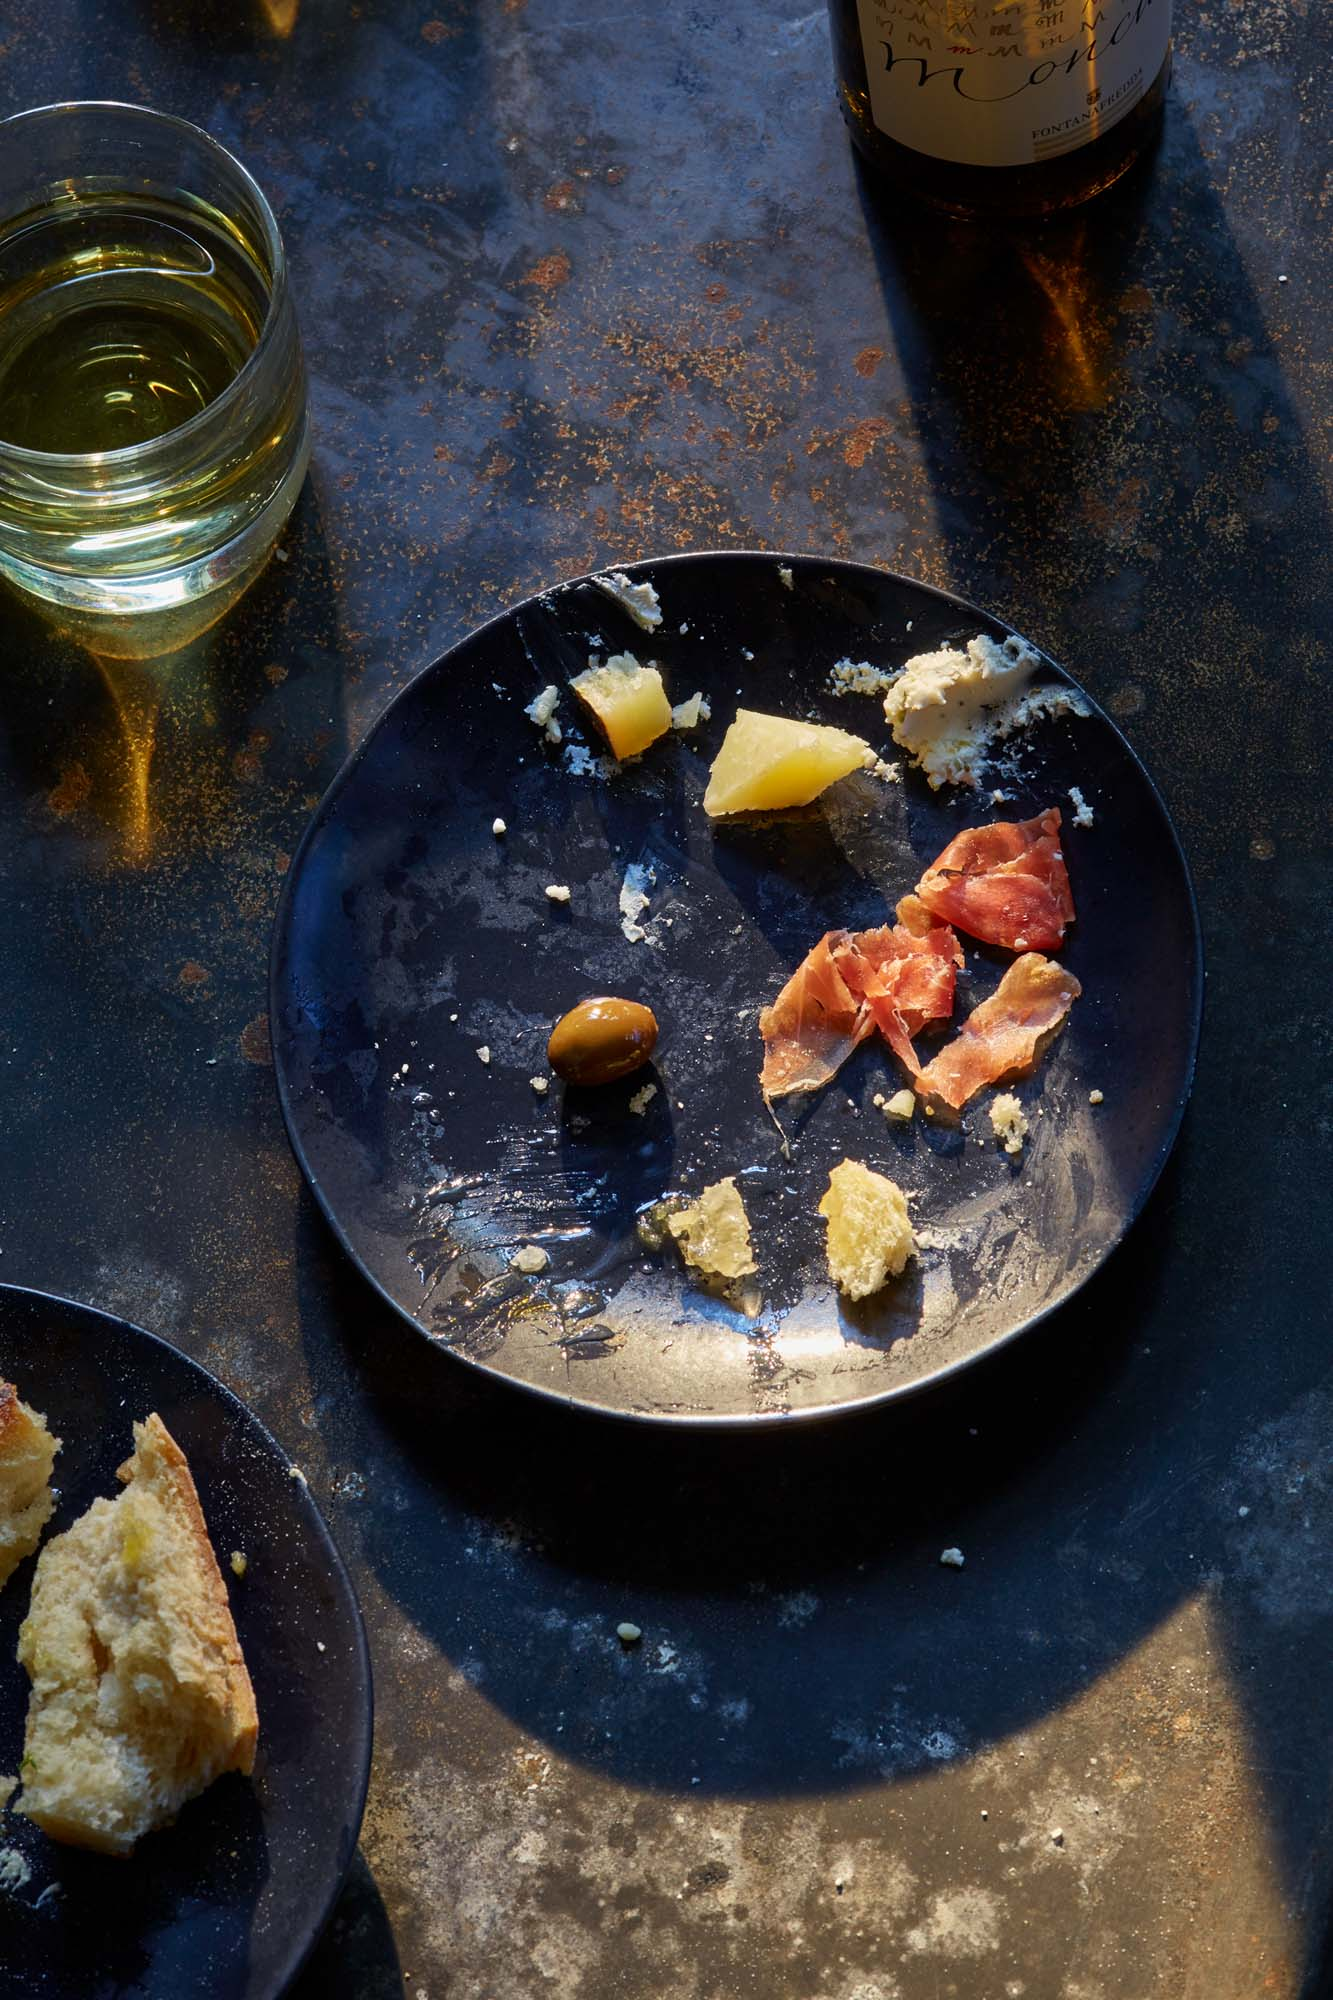 isaiah_jay_italian_food_03.jpg